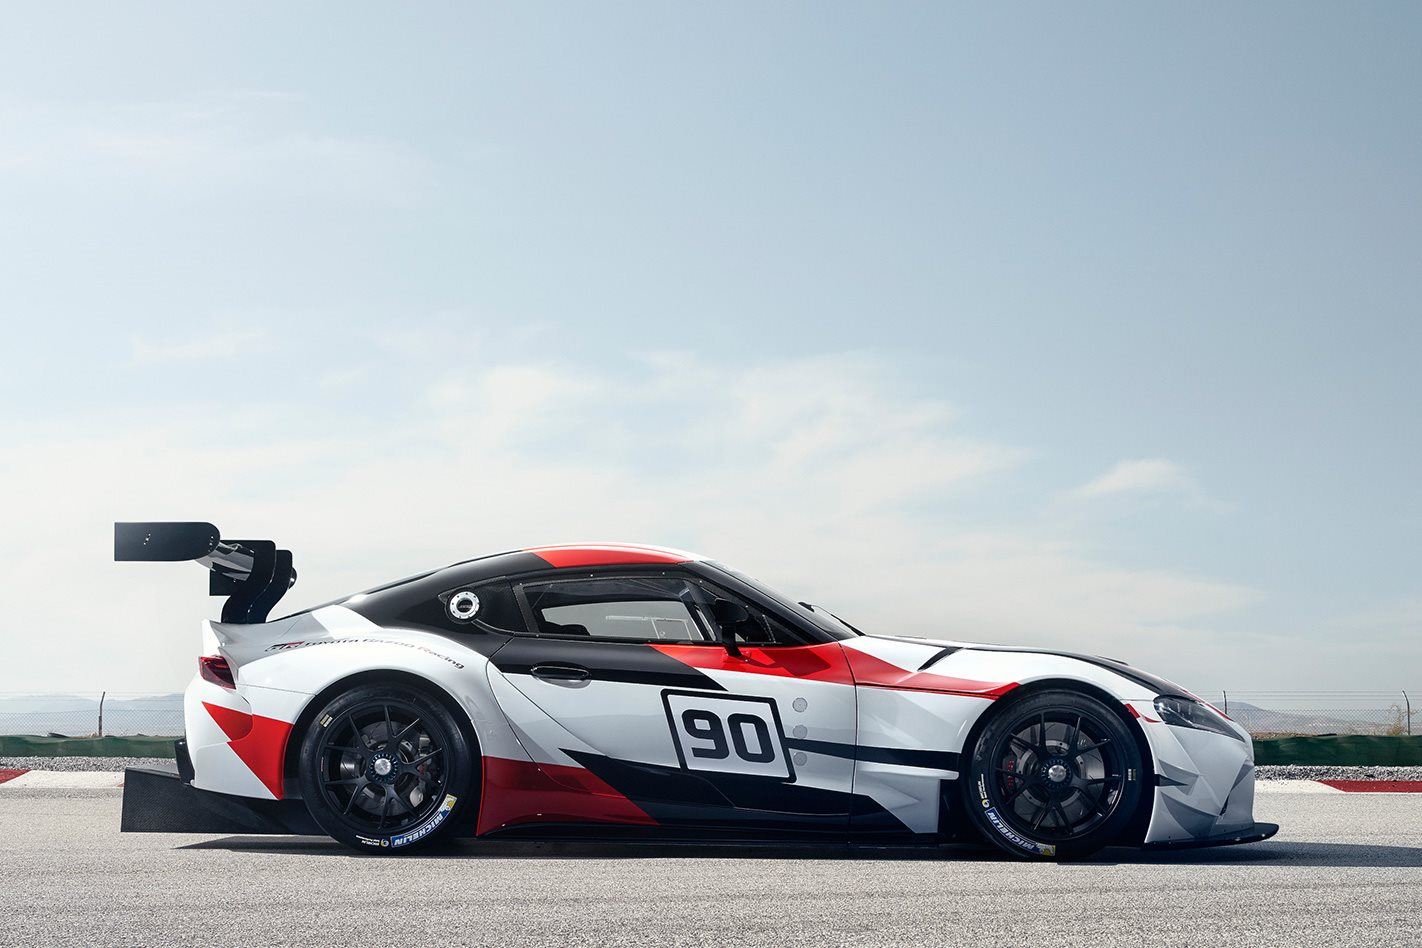 2018 Geneva Motor Show Toyota Gr Supra Racing Concept